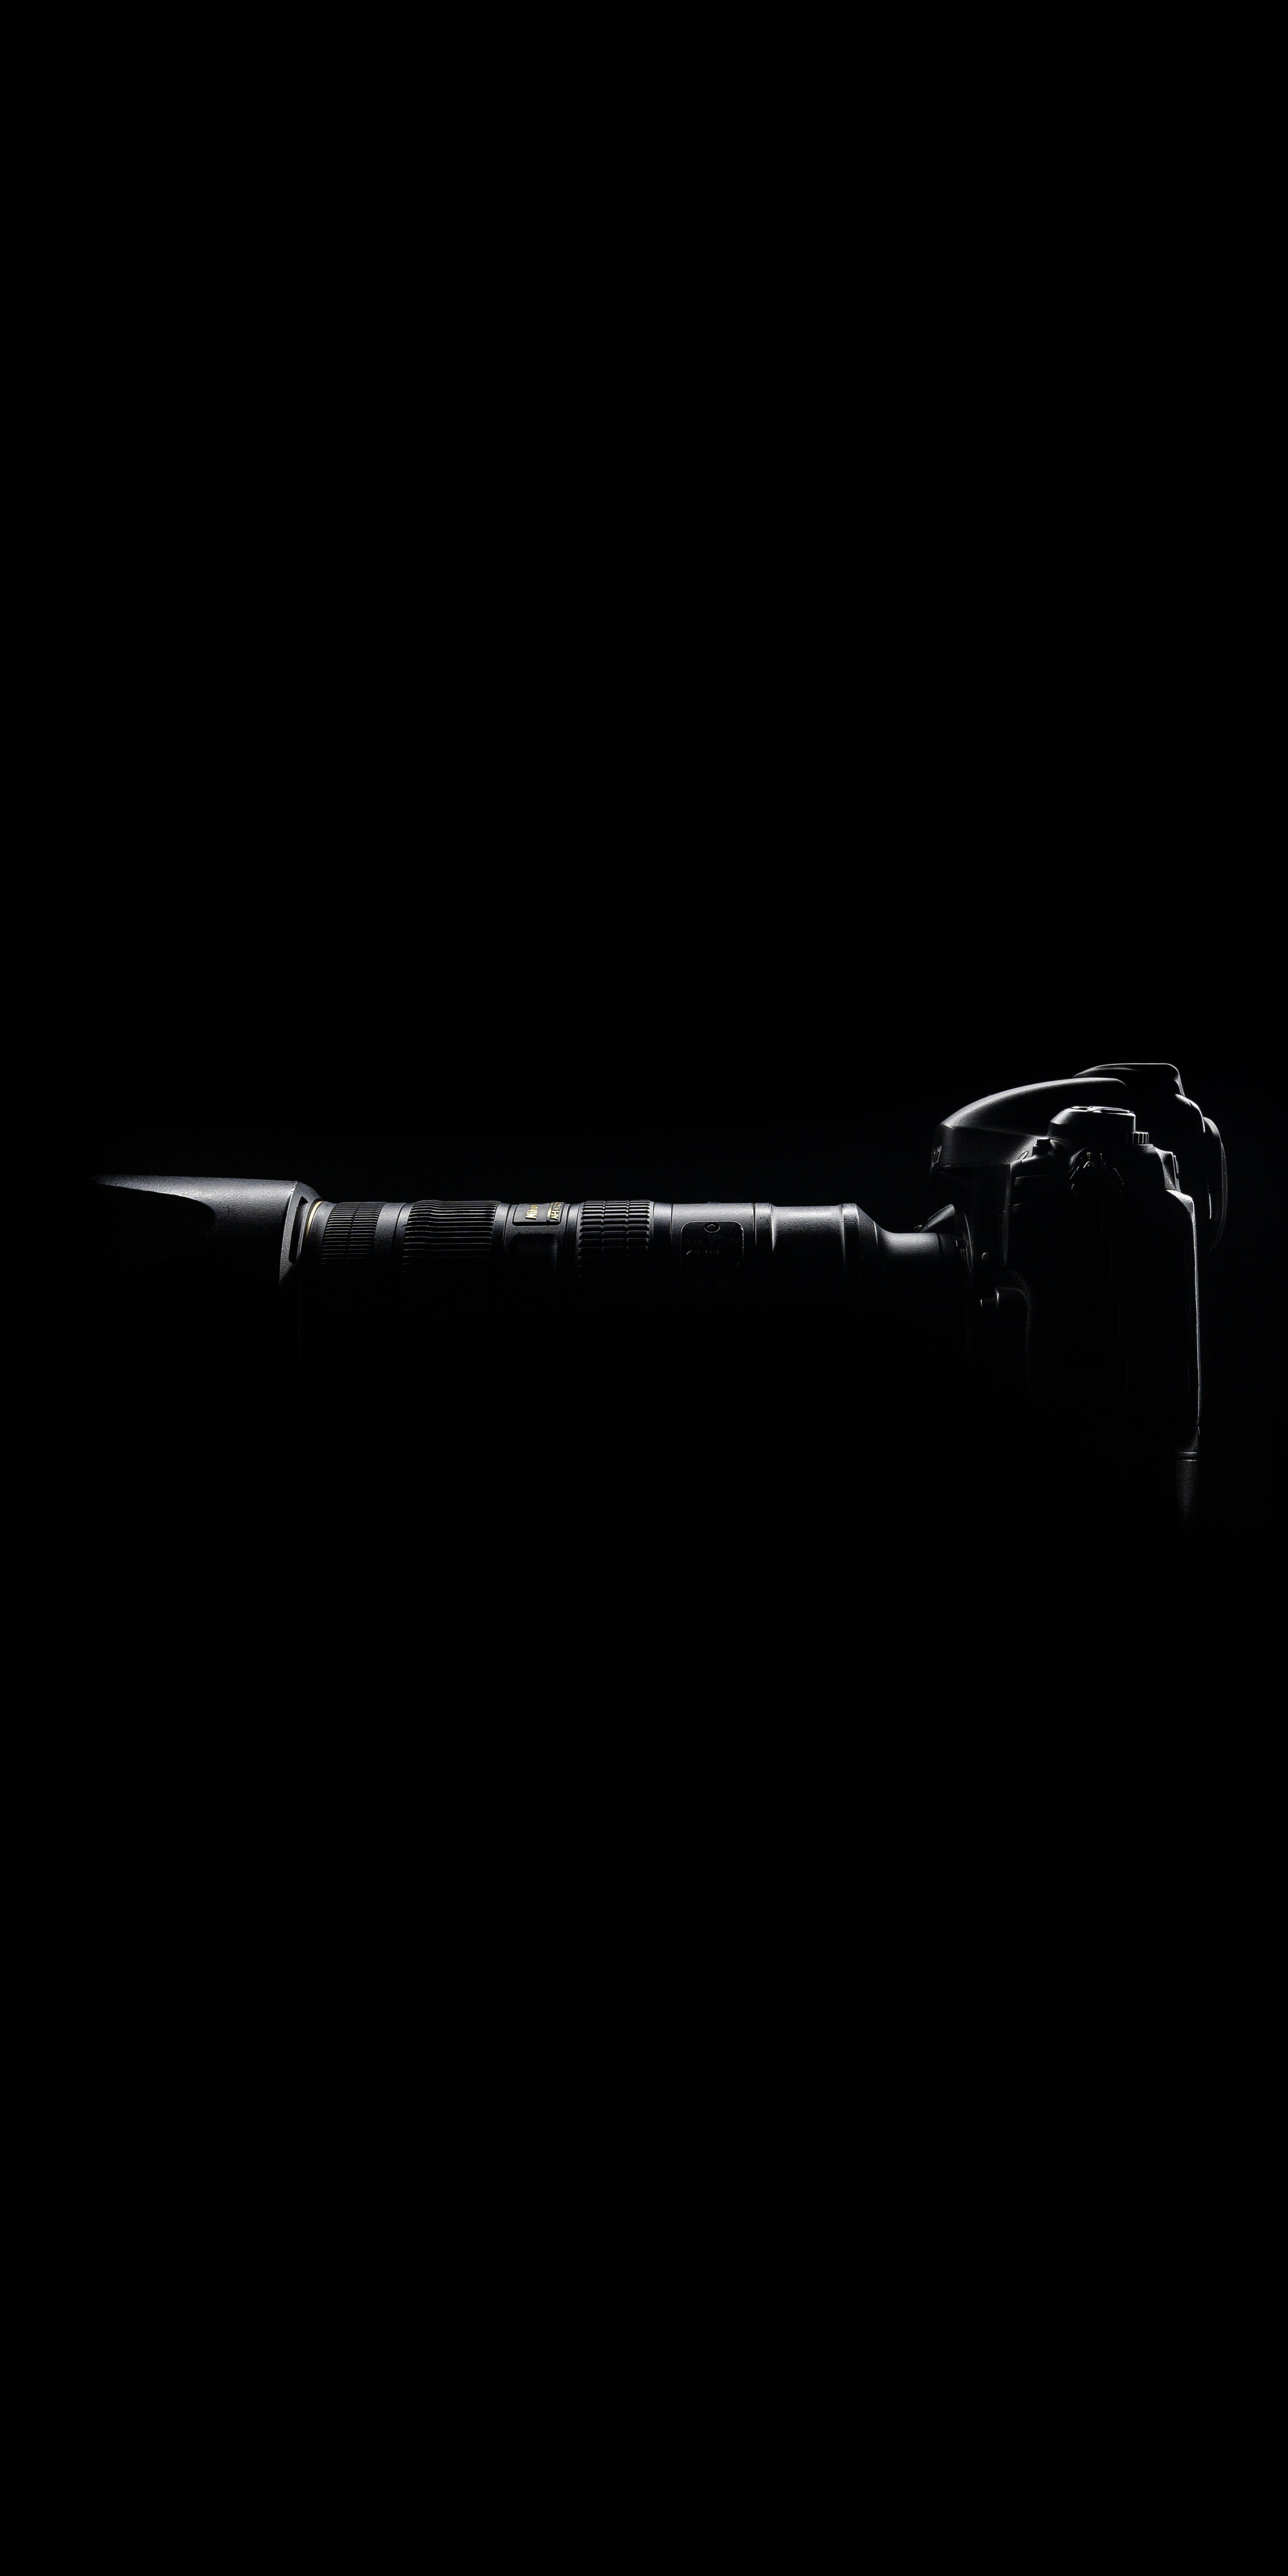 Free stock photo of camera, dark, photography, technology